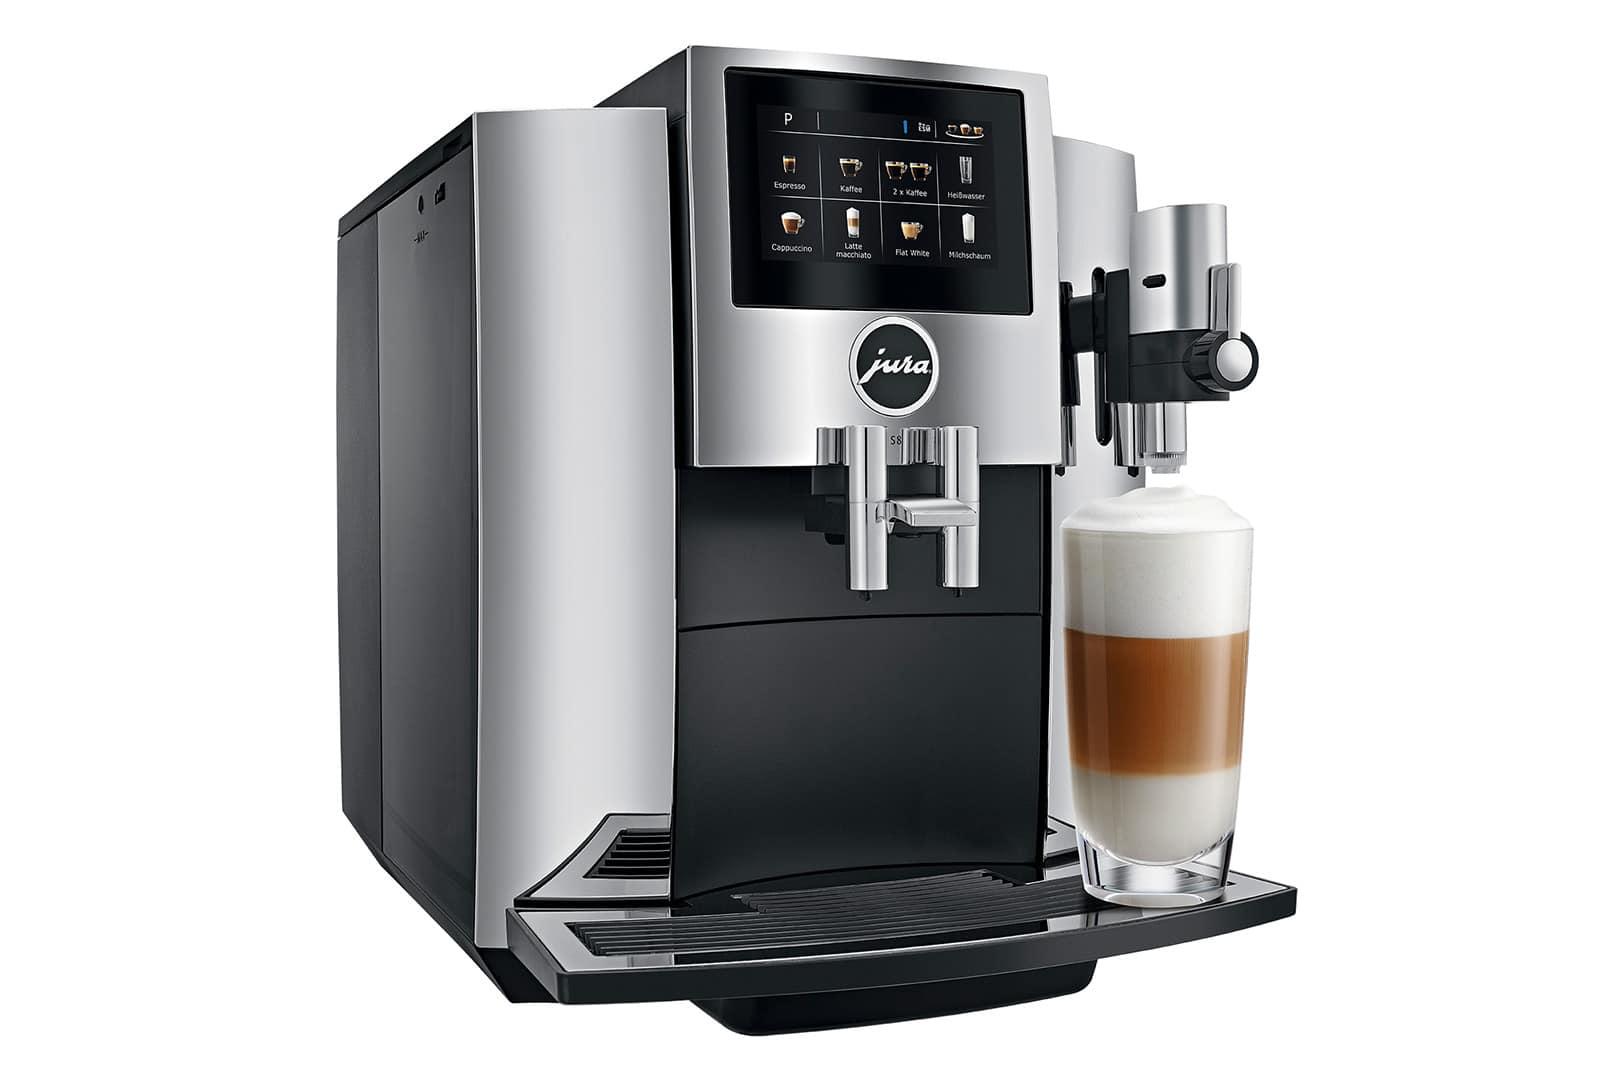 machine a cafe jura s8 chrome br lerie pau 39 s caf. Black Bedroom Furniture Sets. Home Design Ideas